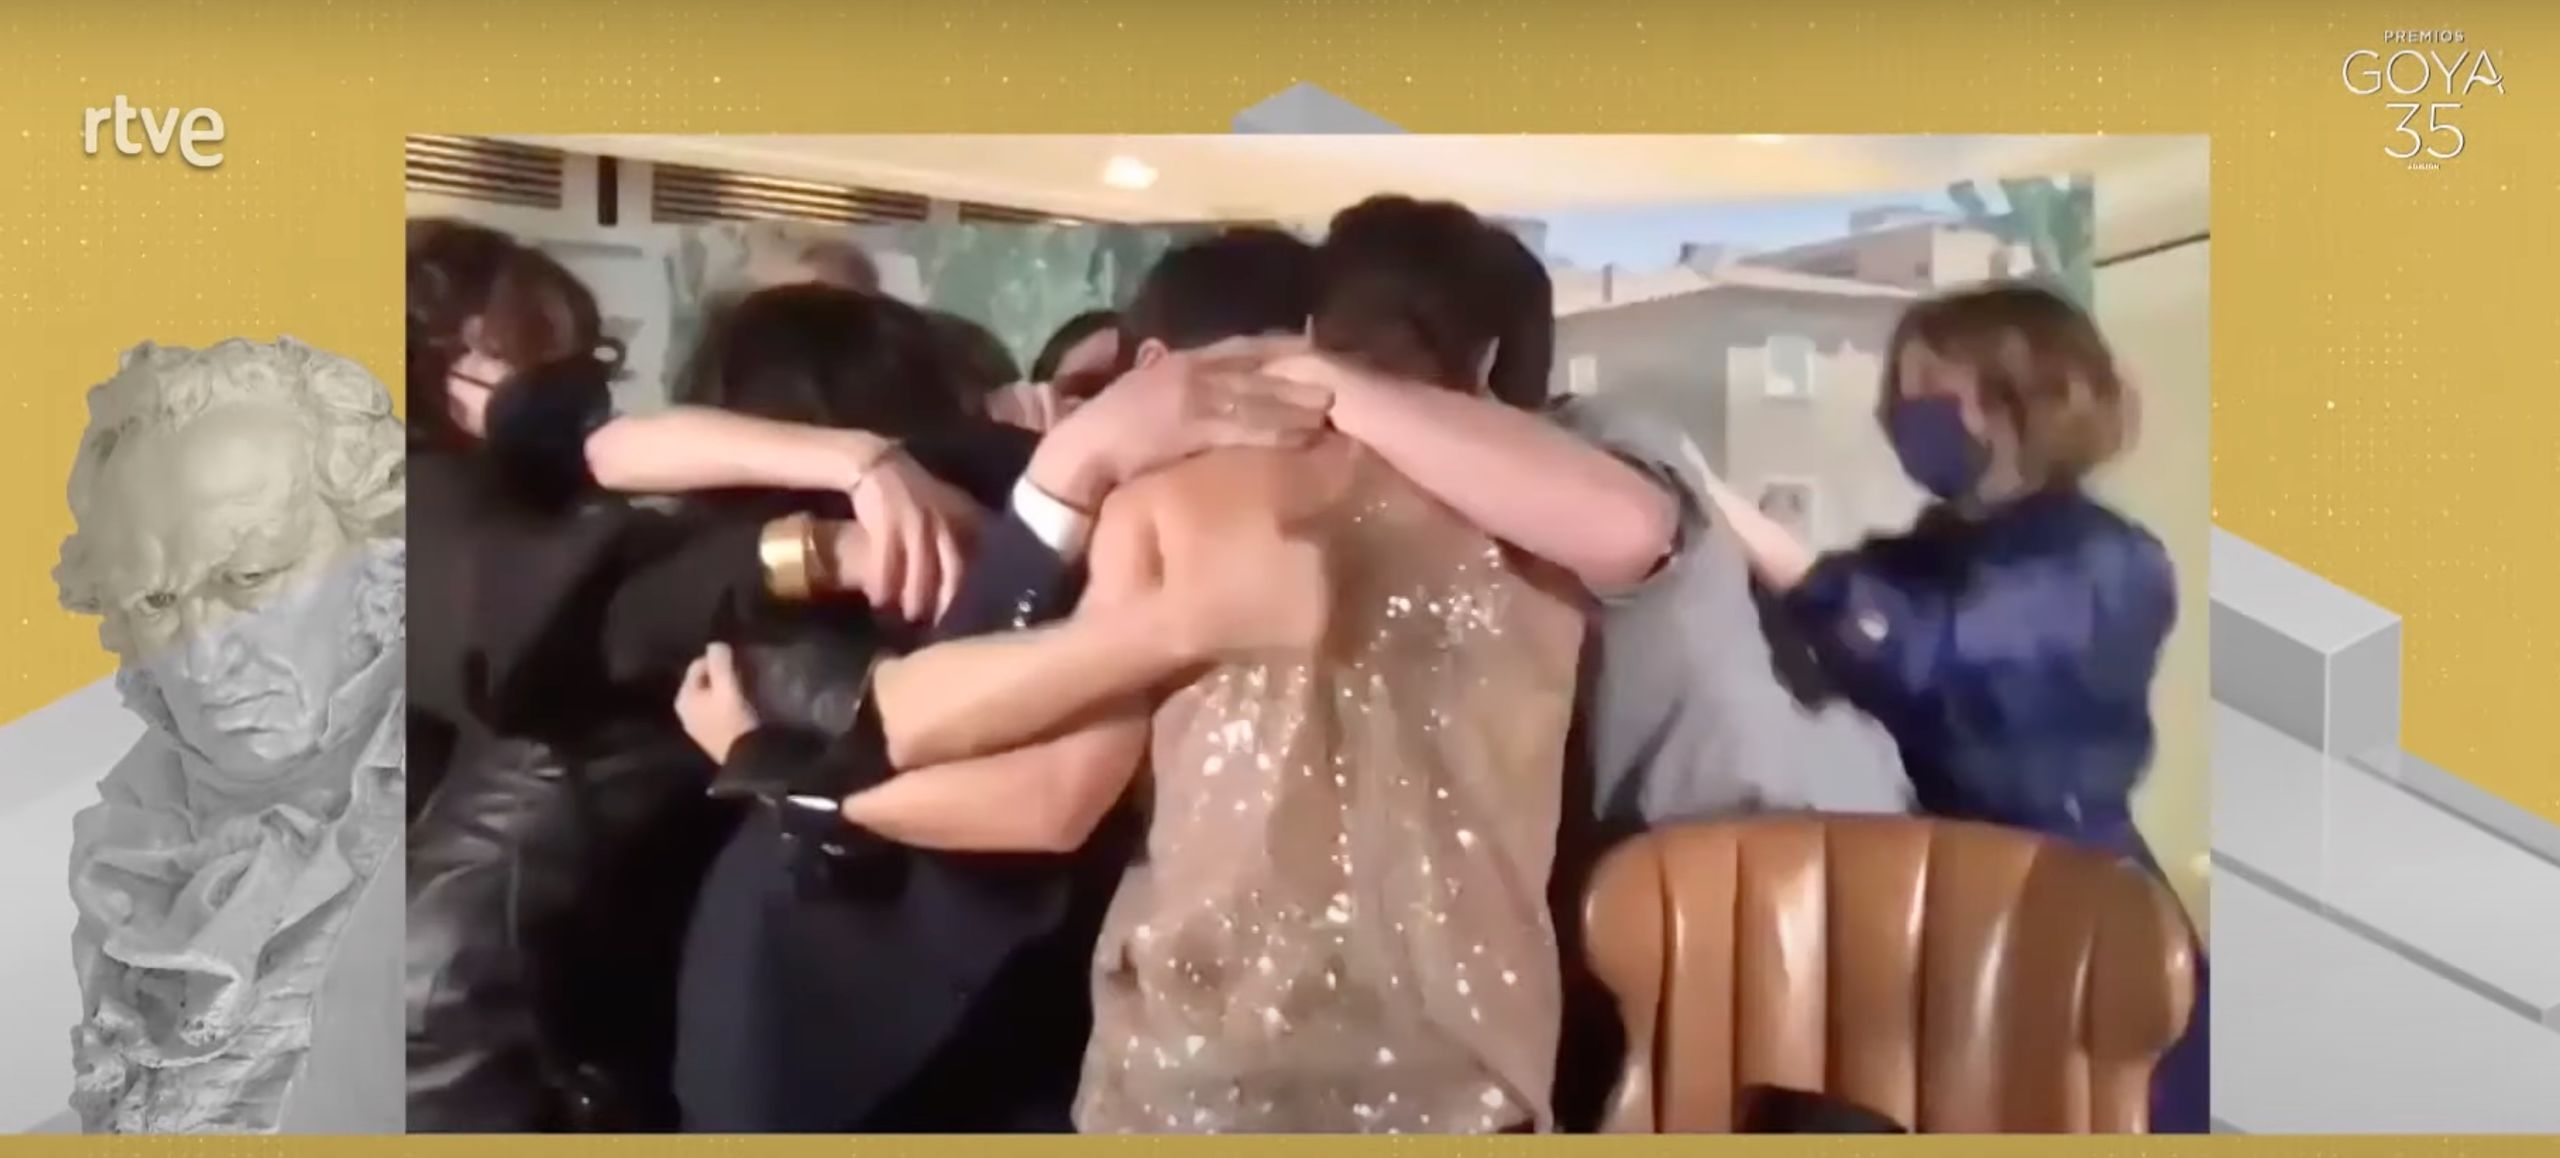 premios-goya-2021-abrazos.jpg